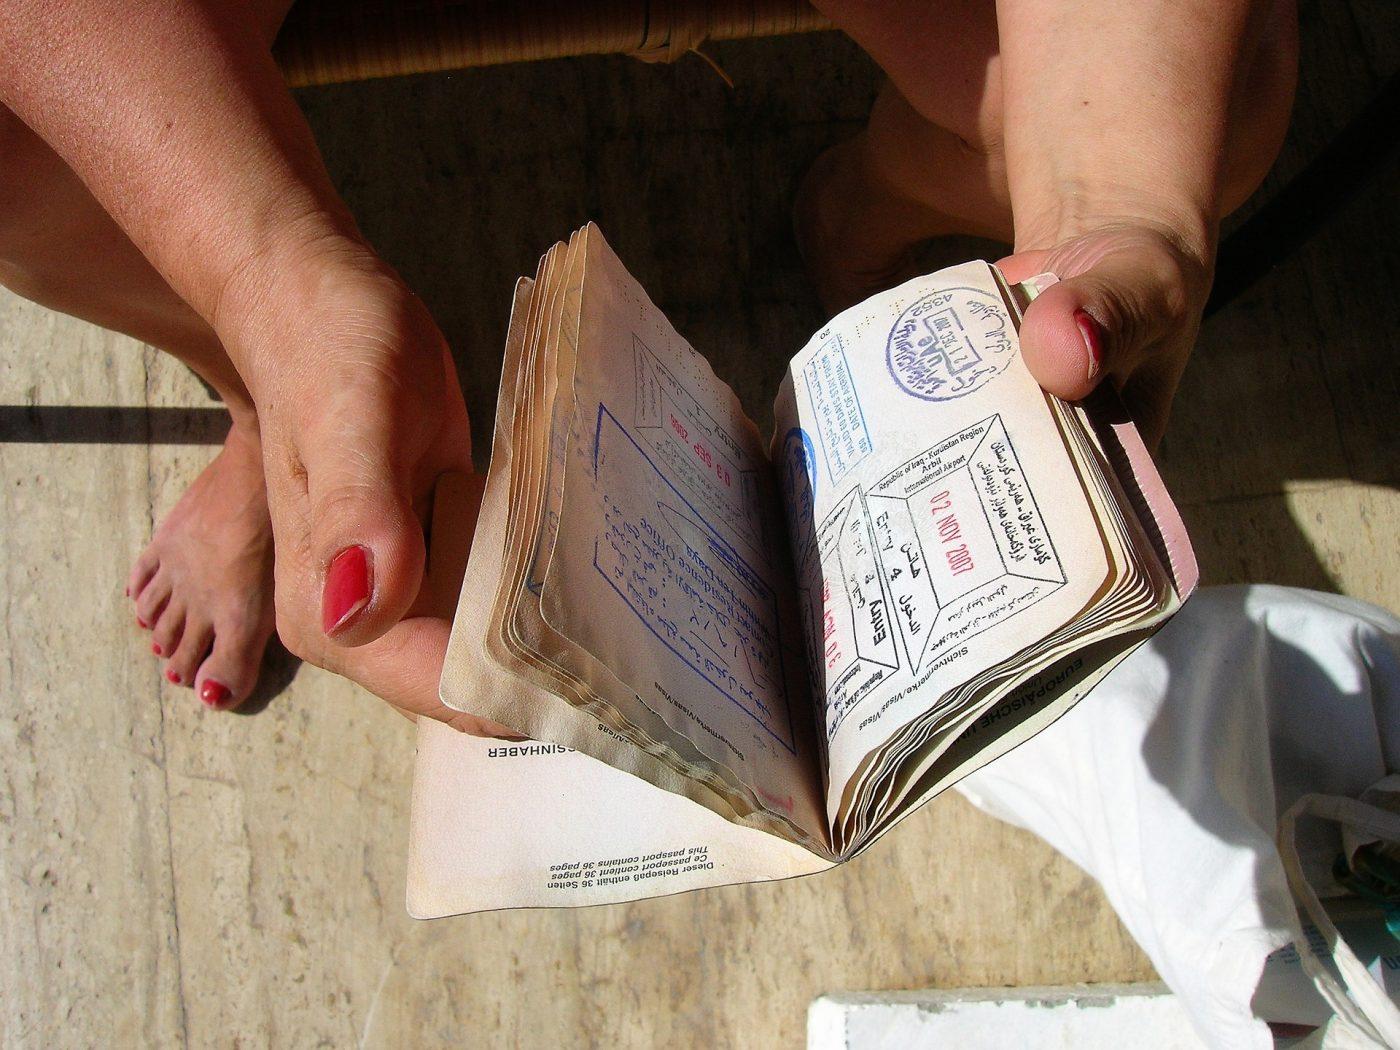 Minimalism: passport stamps